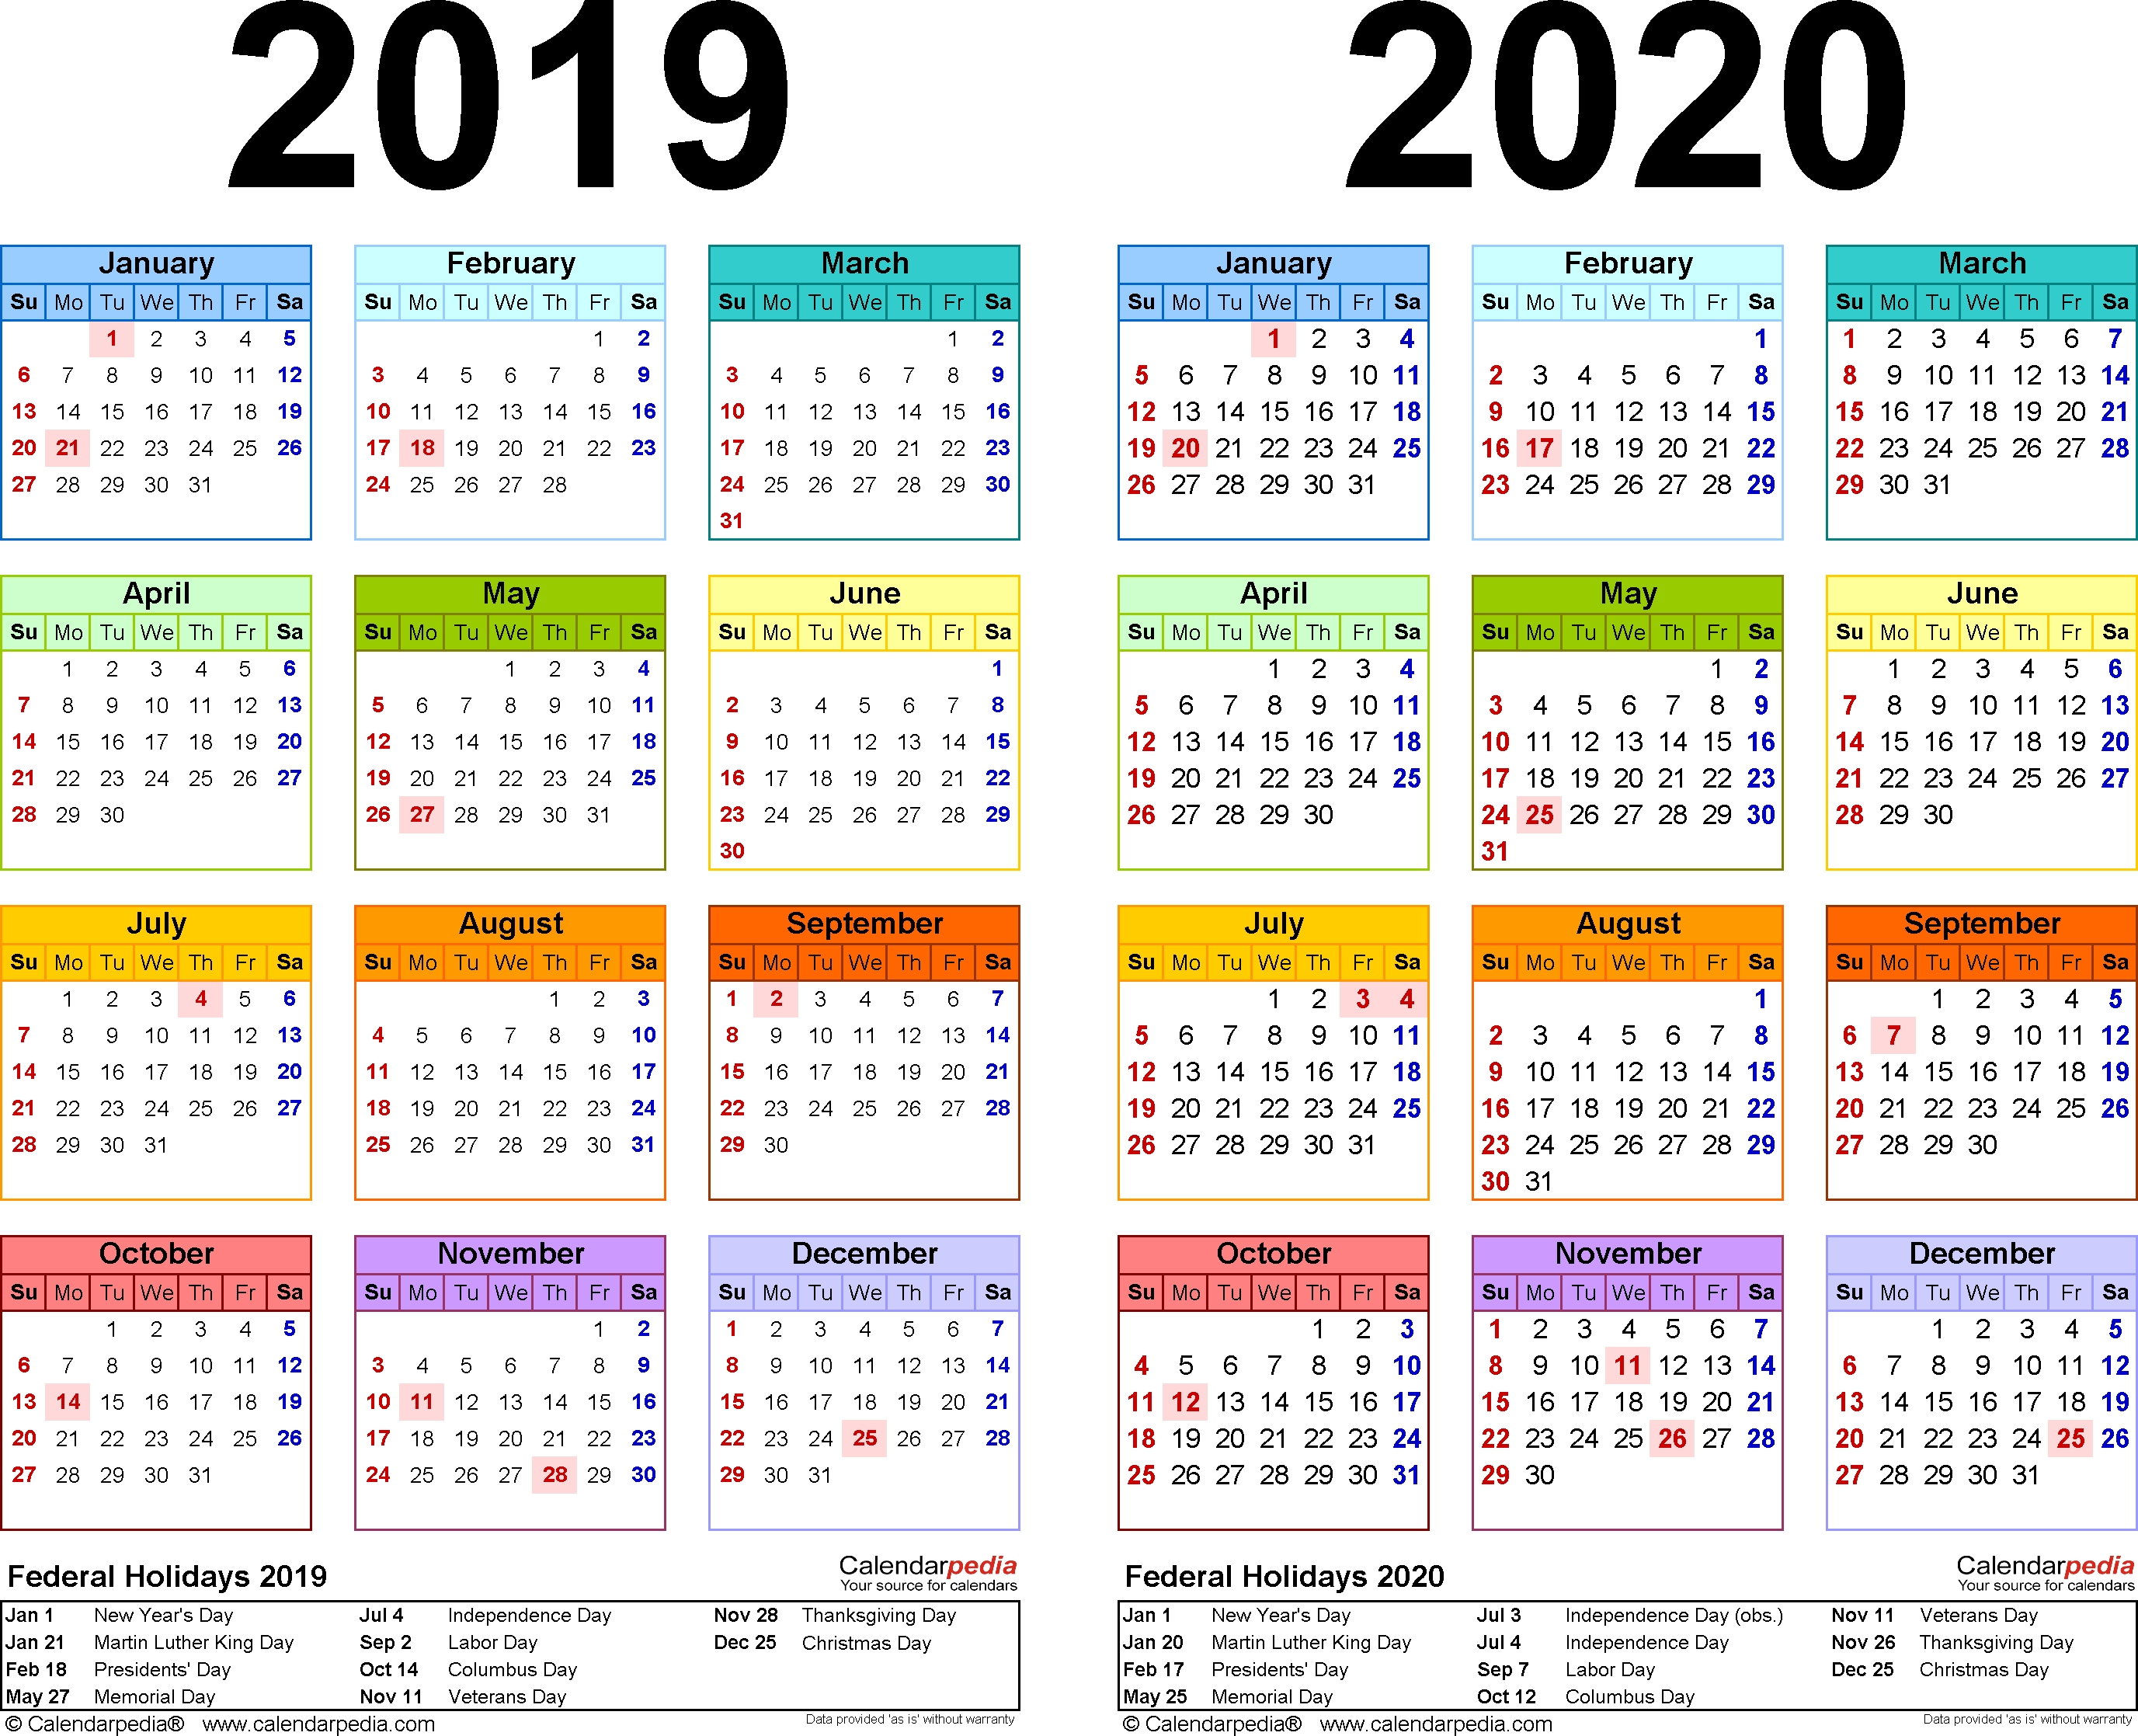 2019-2020 Calendar - Free Printable Two-Year Word Calendars regarding Outlook Calendar 2020